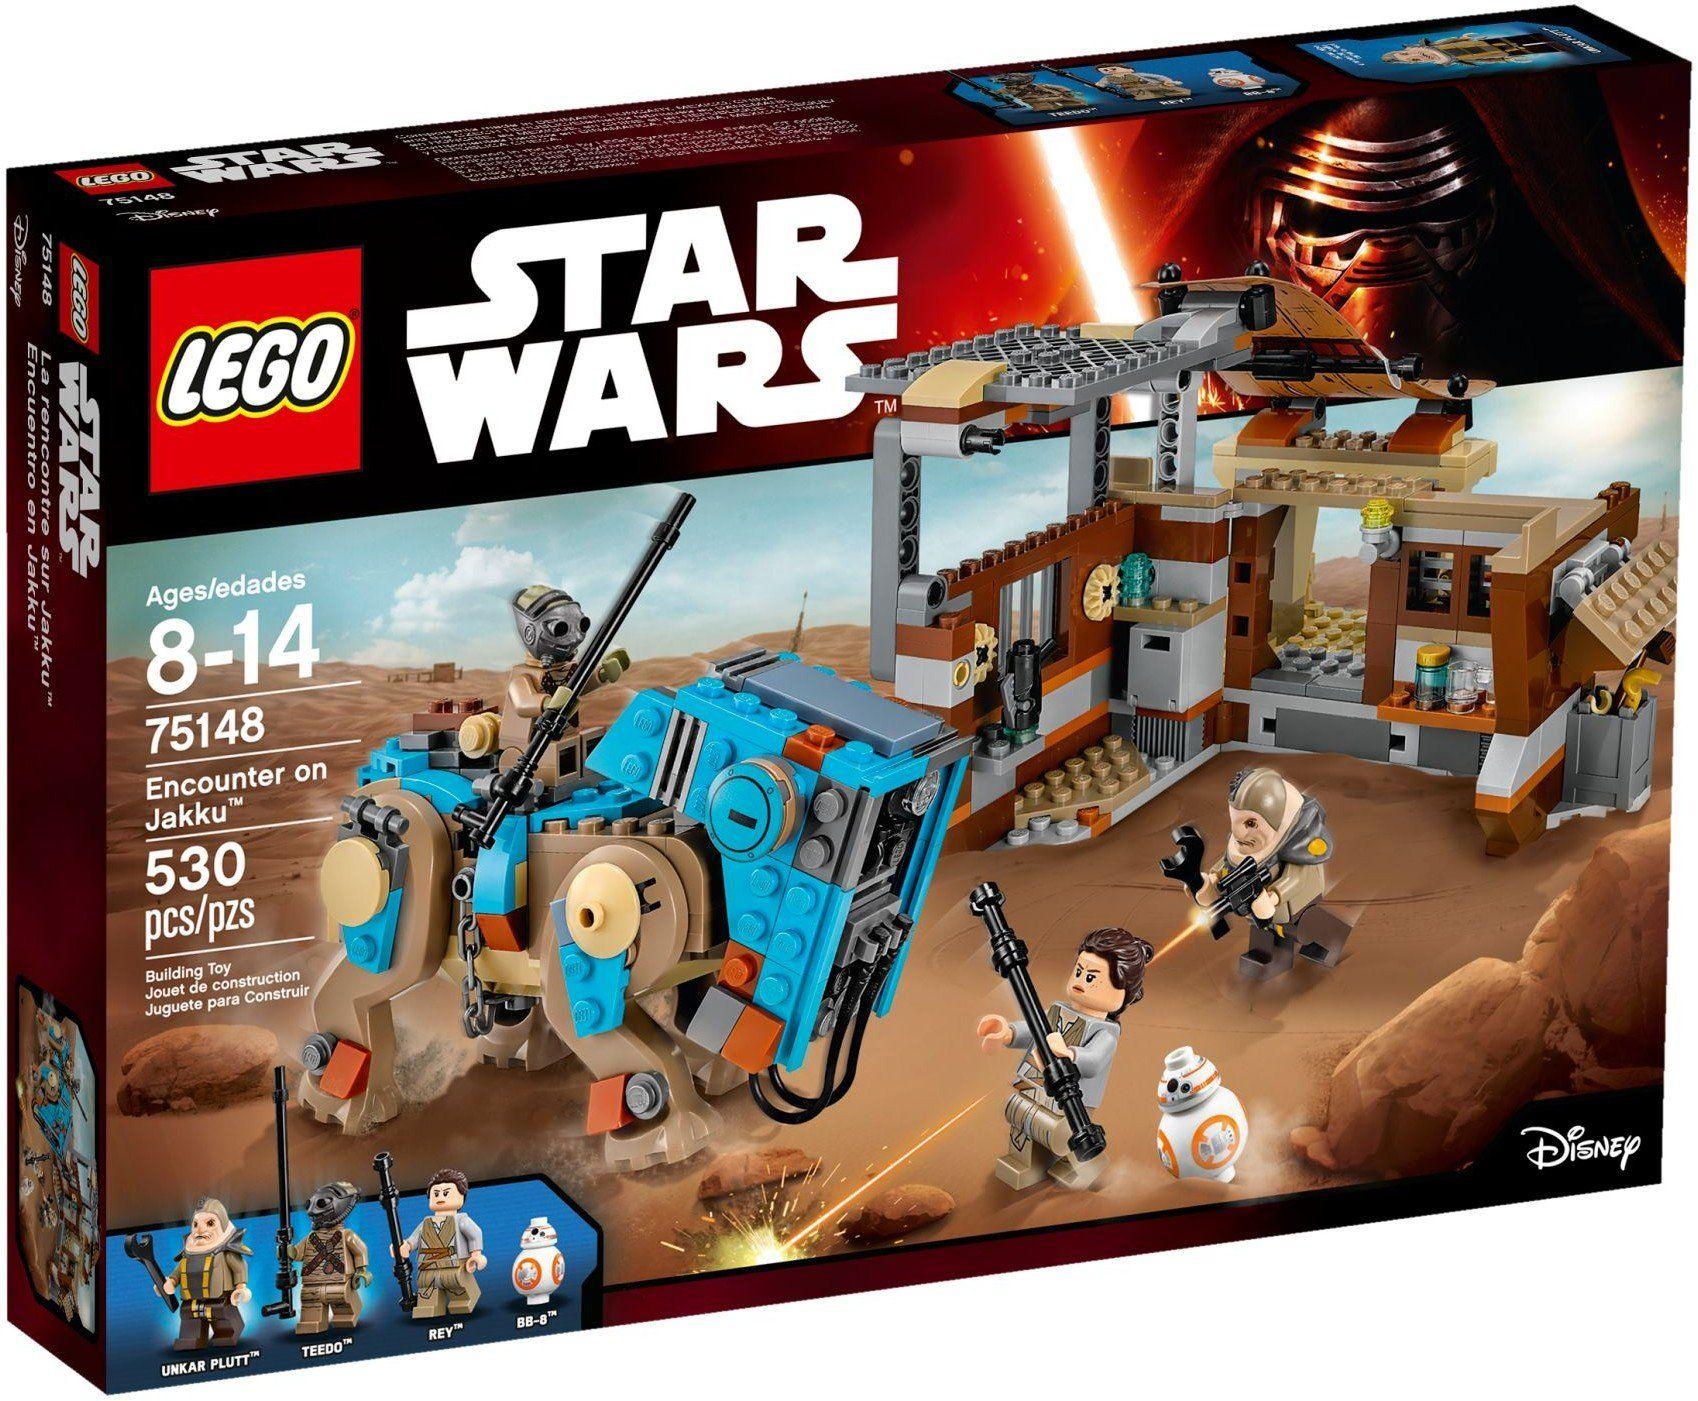 Конструктор Lego Star Wars TM - Сблъсъка на Жаку (75148) - 1